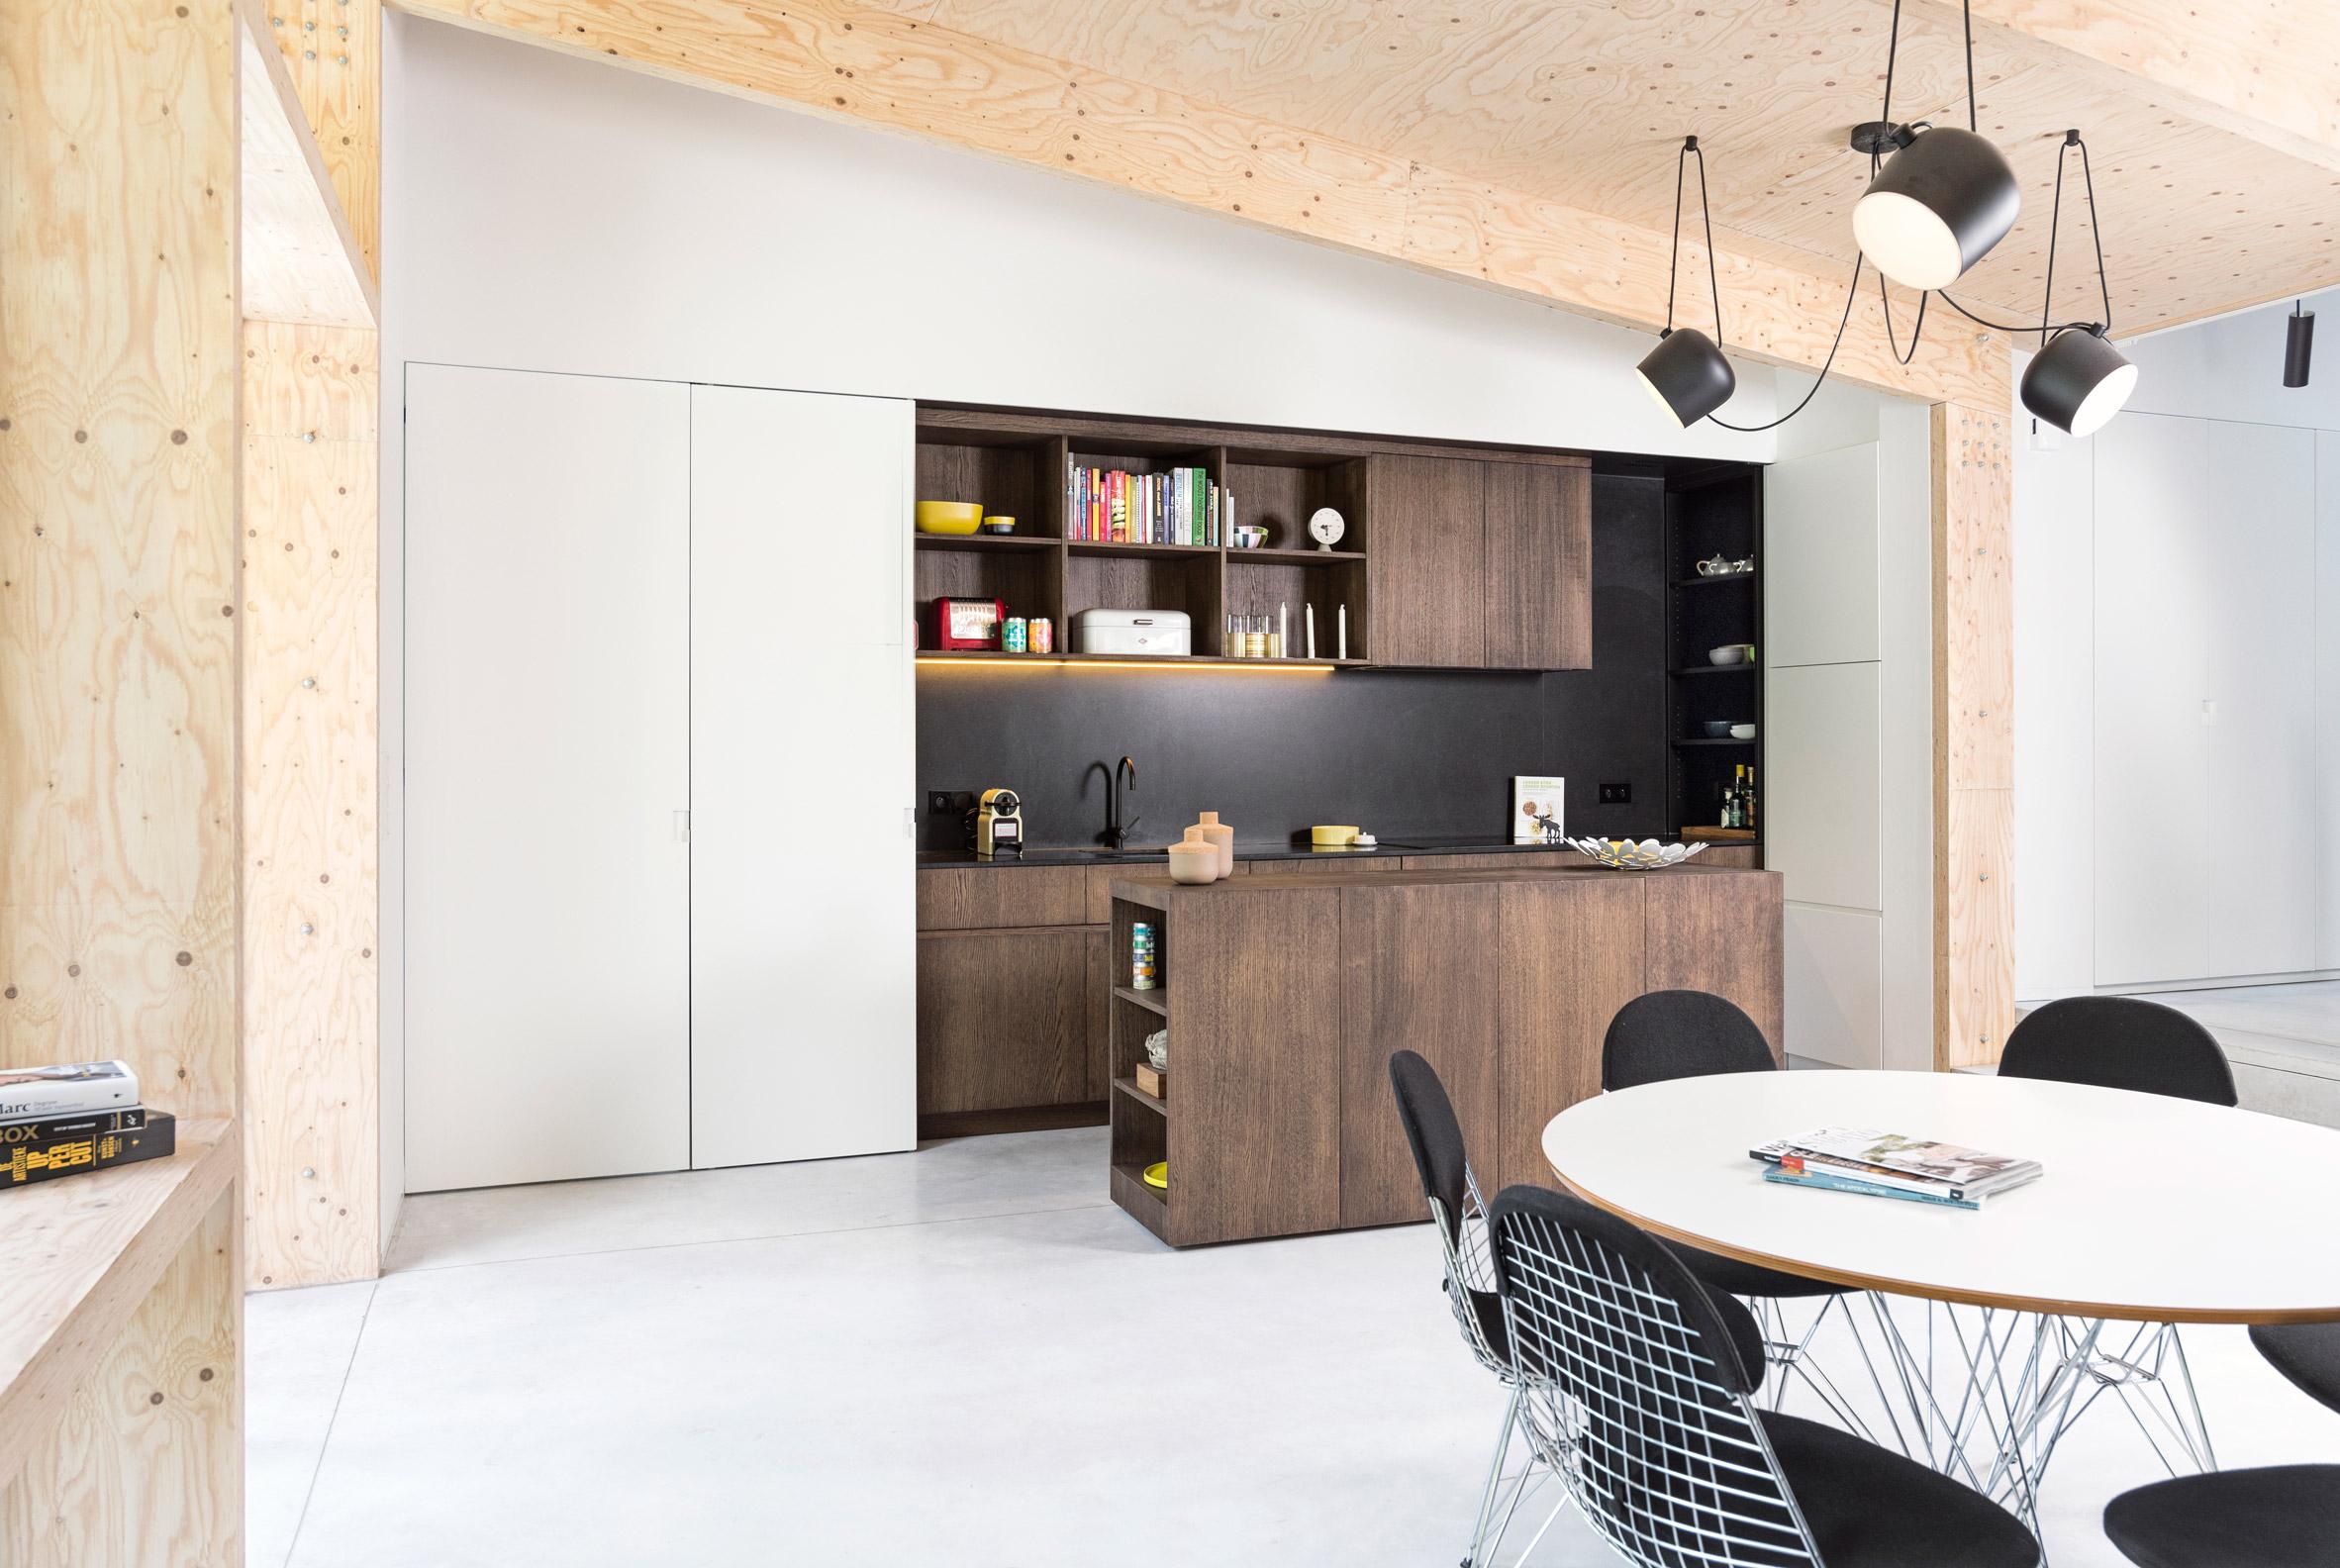 architecture-semi-detached-house-with-an-outdoor-areadesign-studia-interiors-osnovadesign-osnova-poltava_14